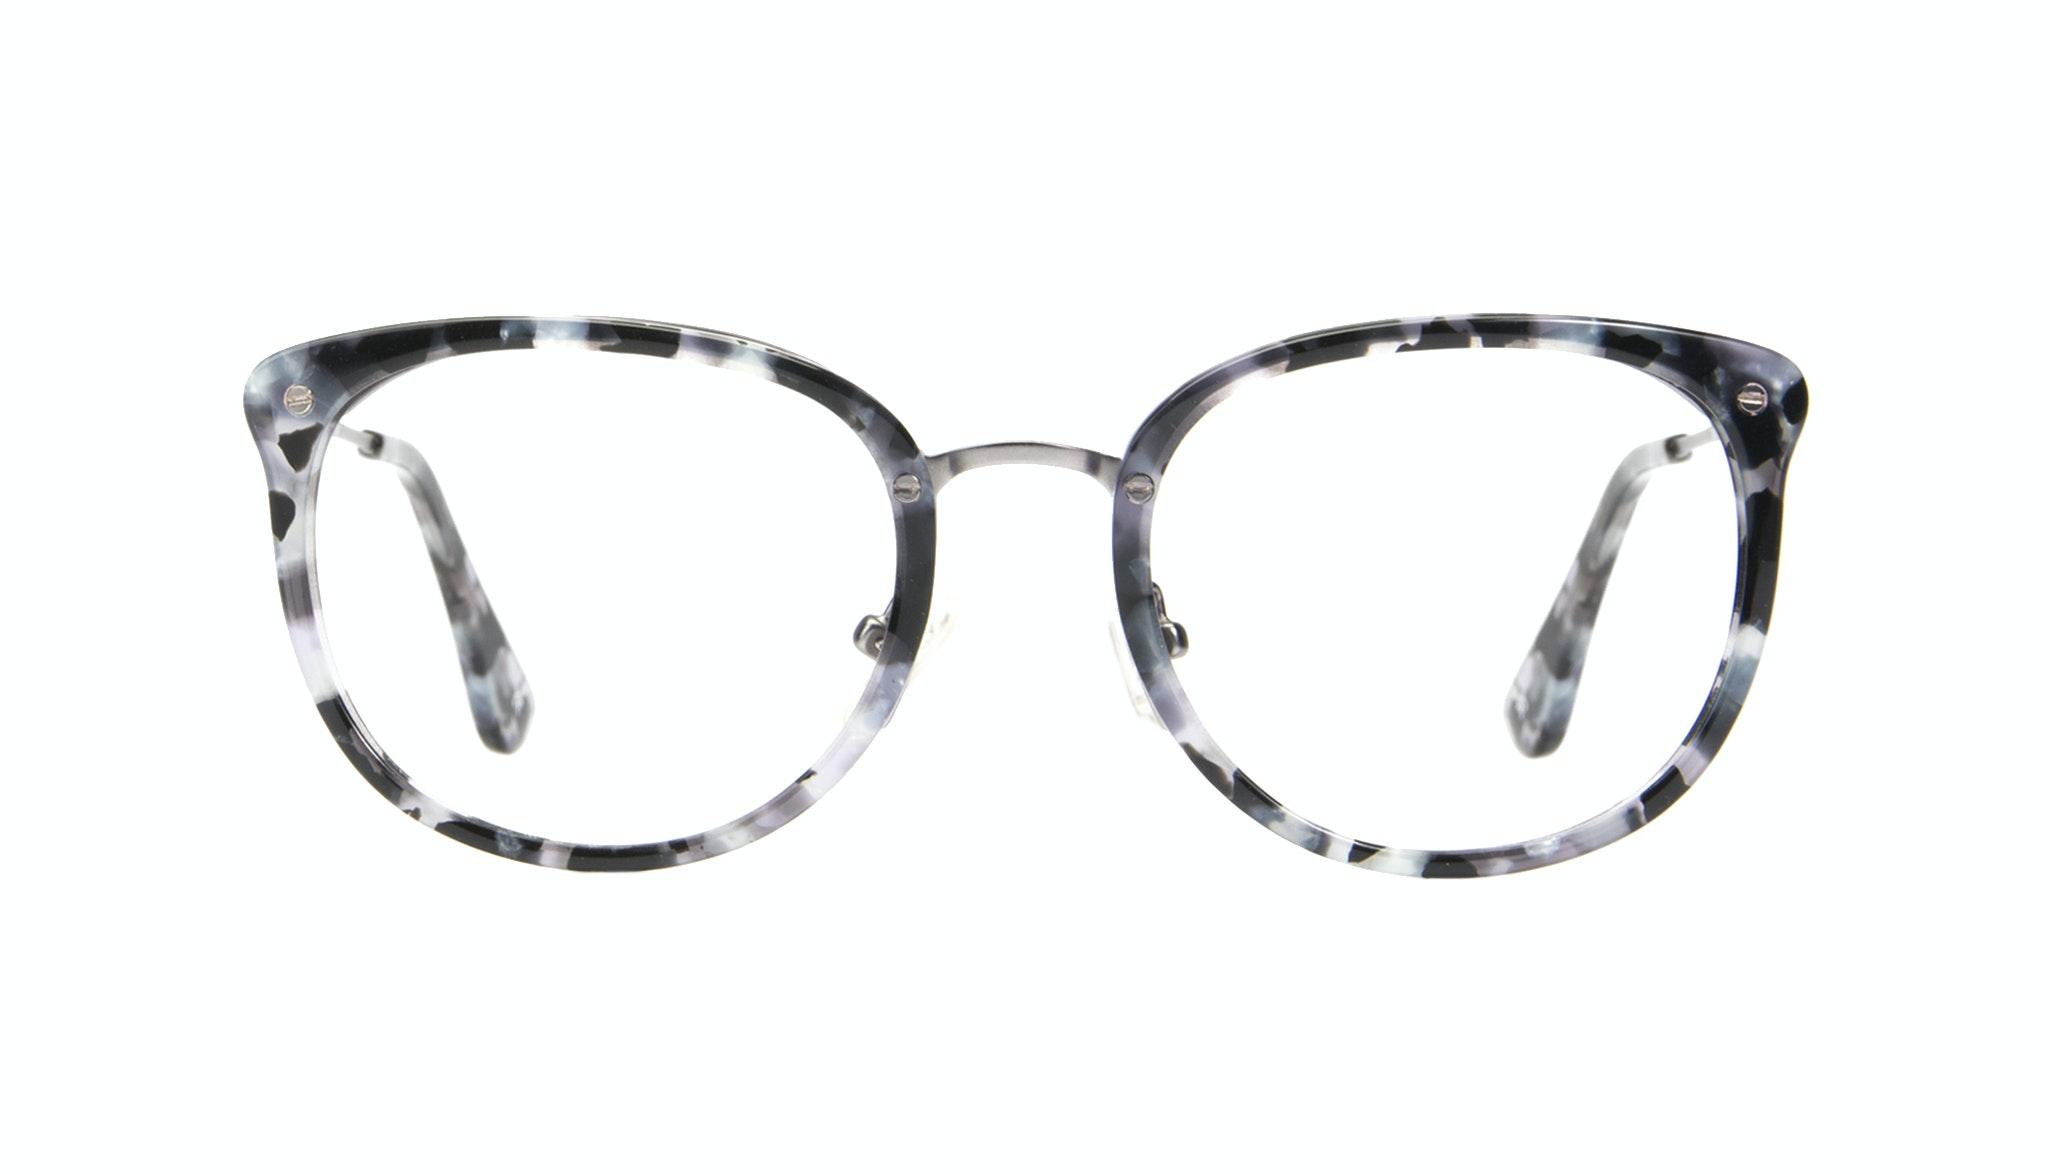 Affordable Fashion Glasses Square Round Eyeglasses Women Amaze Silver Flake Front